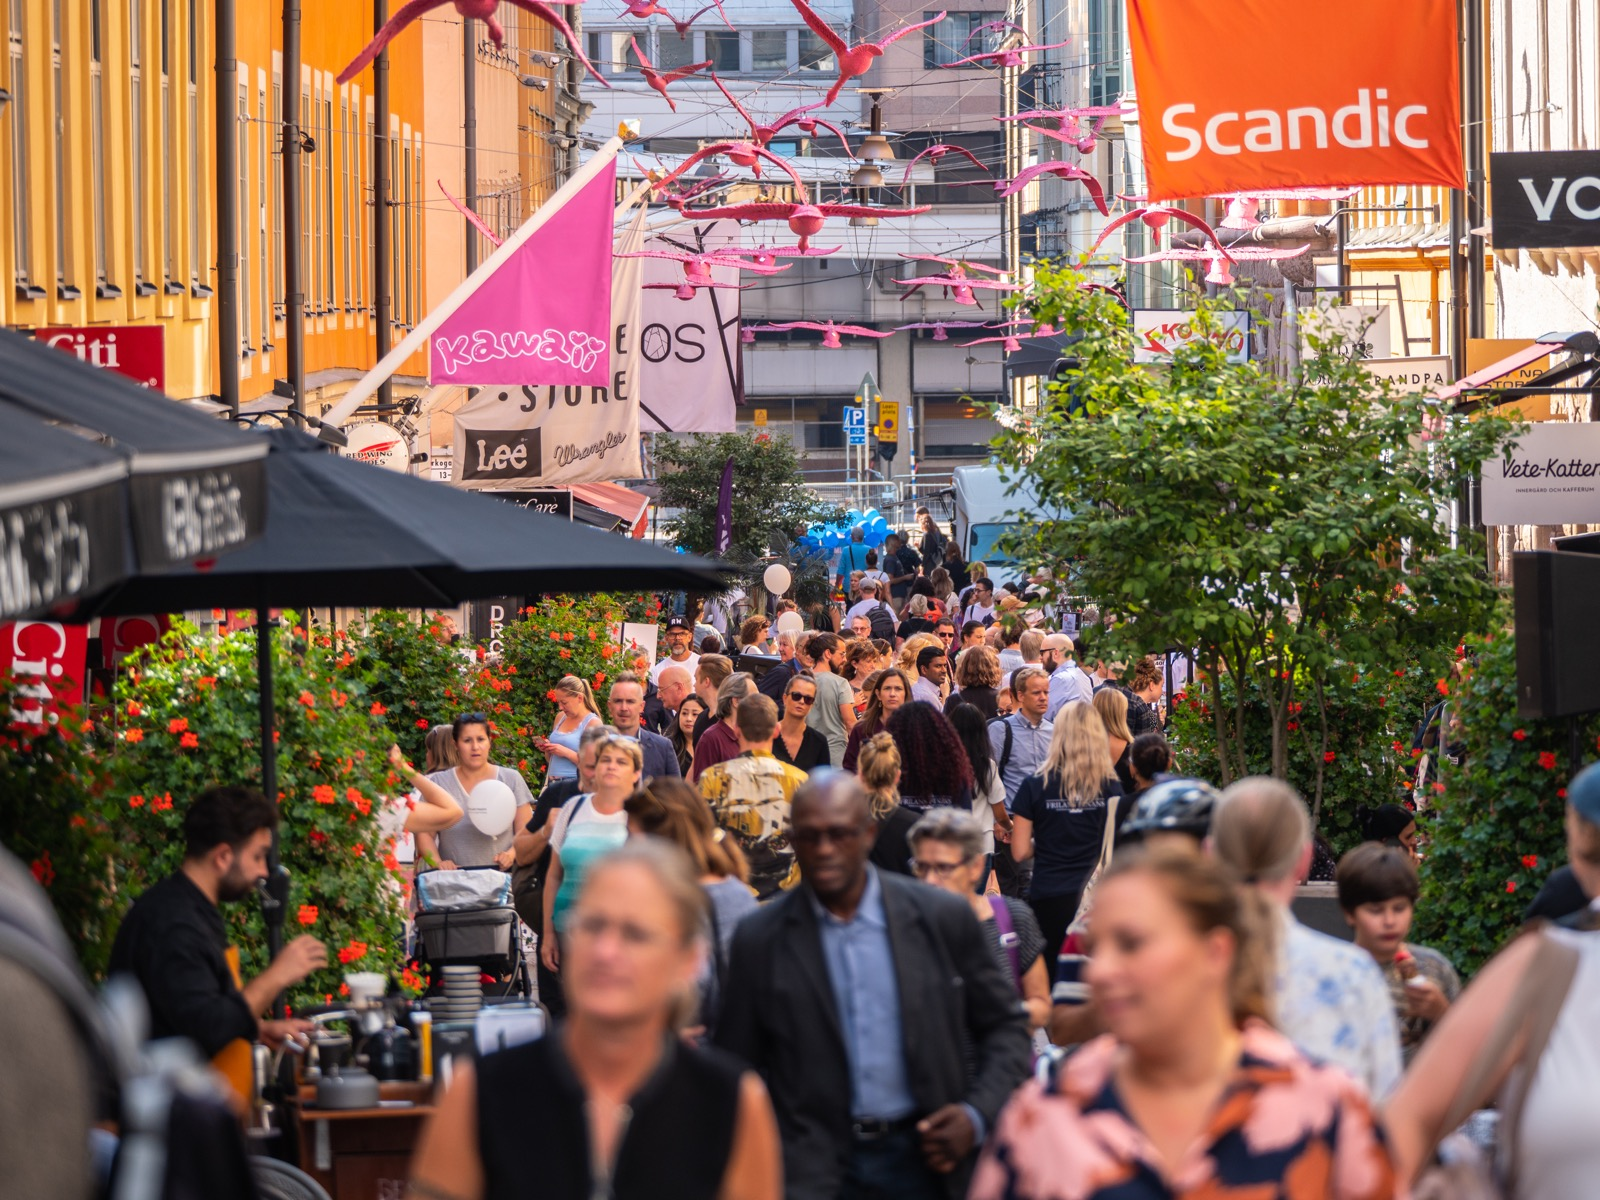 Gamla Brogatan 28 aug 2019 - --ME - @content_by_me - ©Mike Eriksson-1866792-resize-1600.jpg